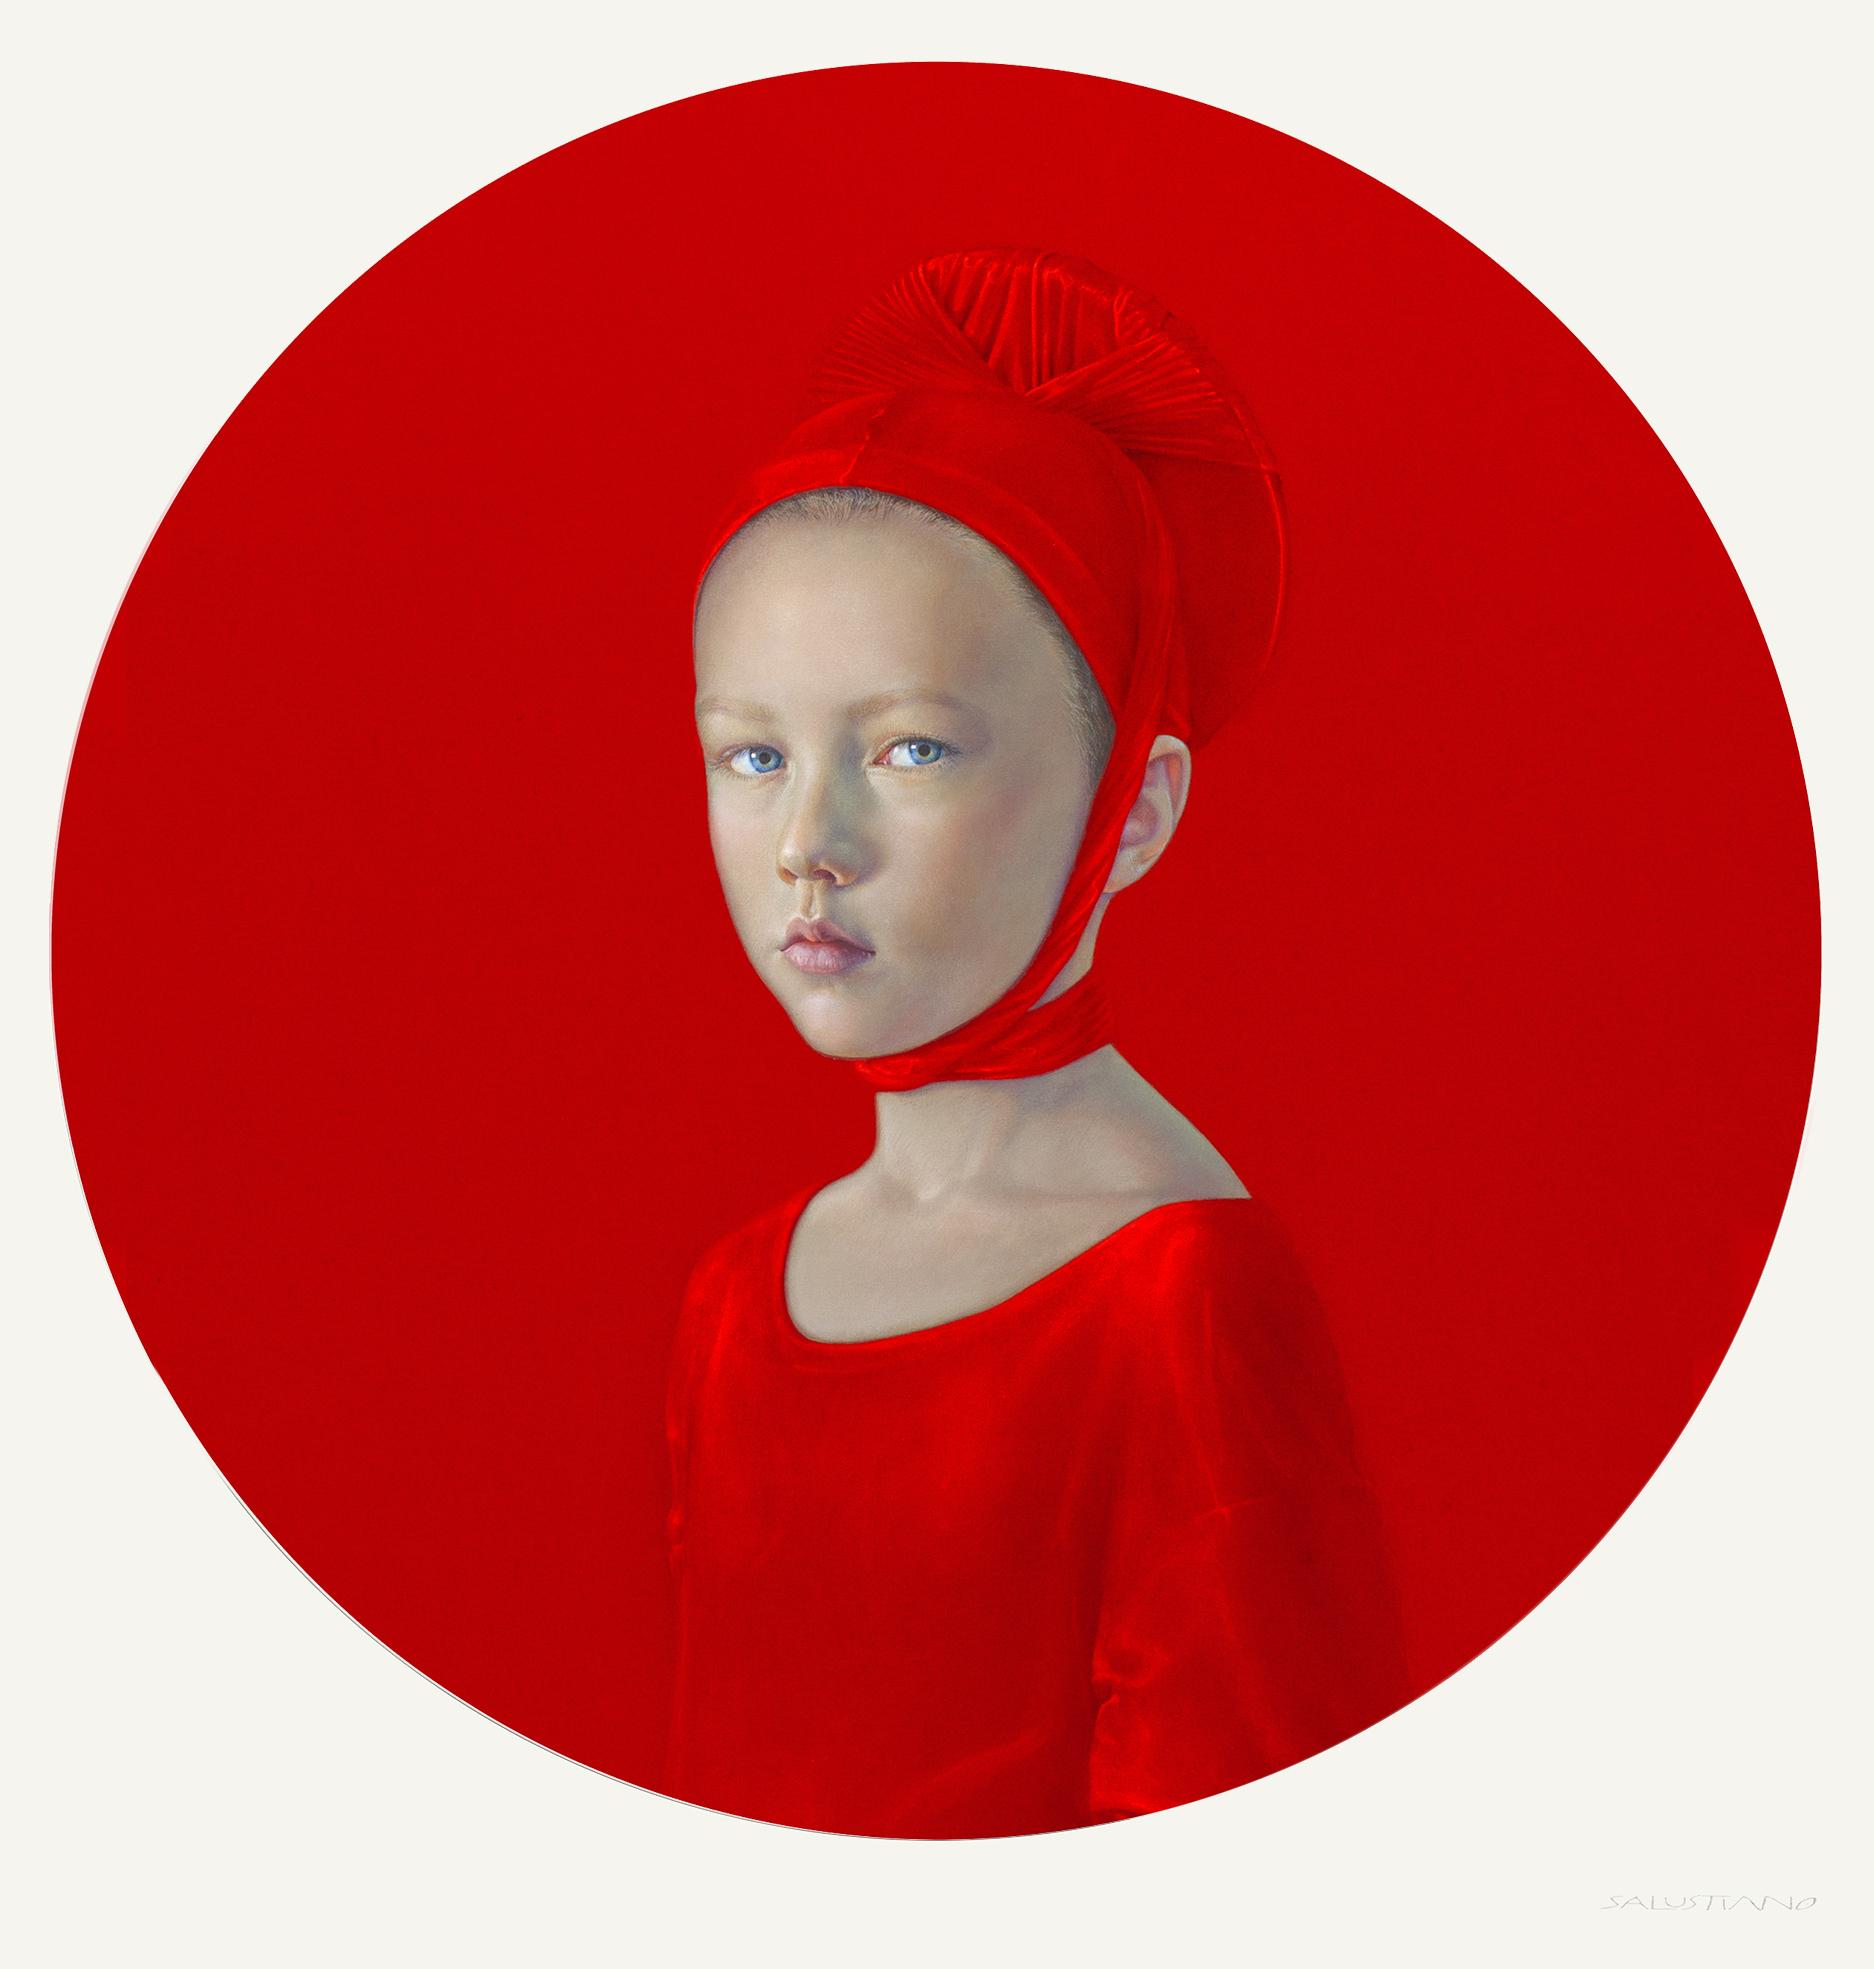 SALUSTIANO_Present Pluscuamperfect No.2_Pigment Print_82x78cm_ed.85_2016_350만원